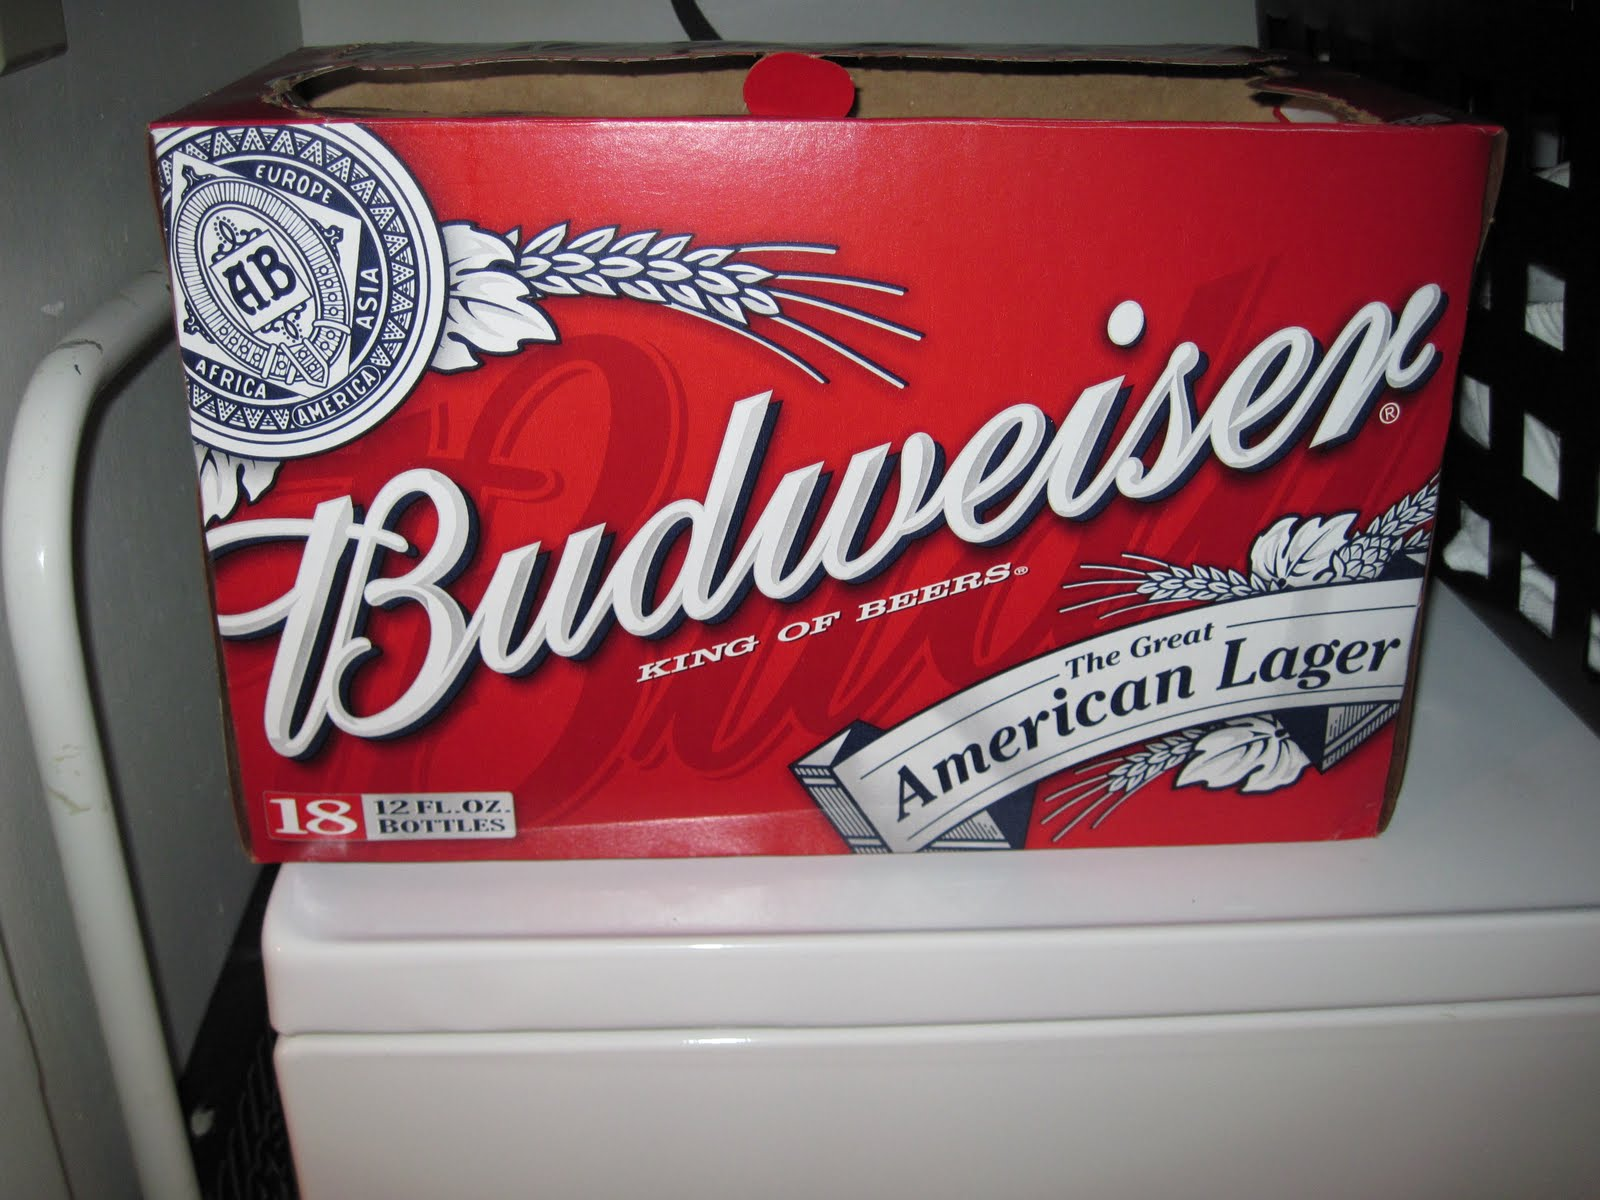 preview of budweiser beer fkirnm hd wallpaper background 24554 1600x1200